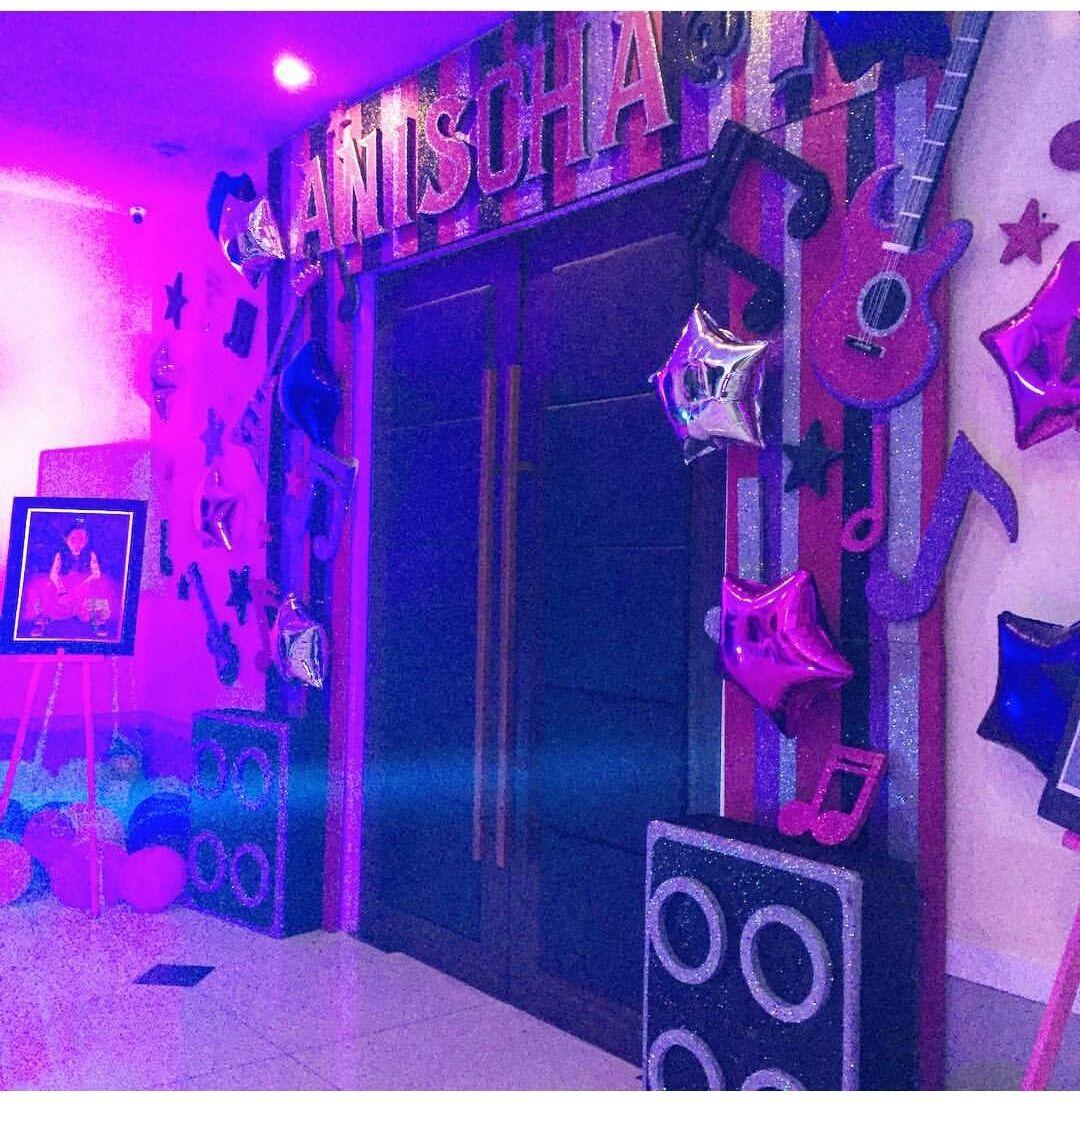 Pin de Mye Manalastas en Rock star Princess | Pinterest | Regalos ...